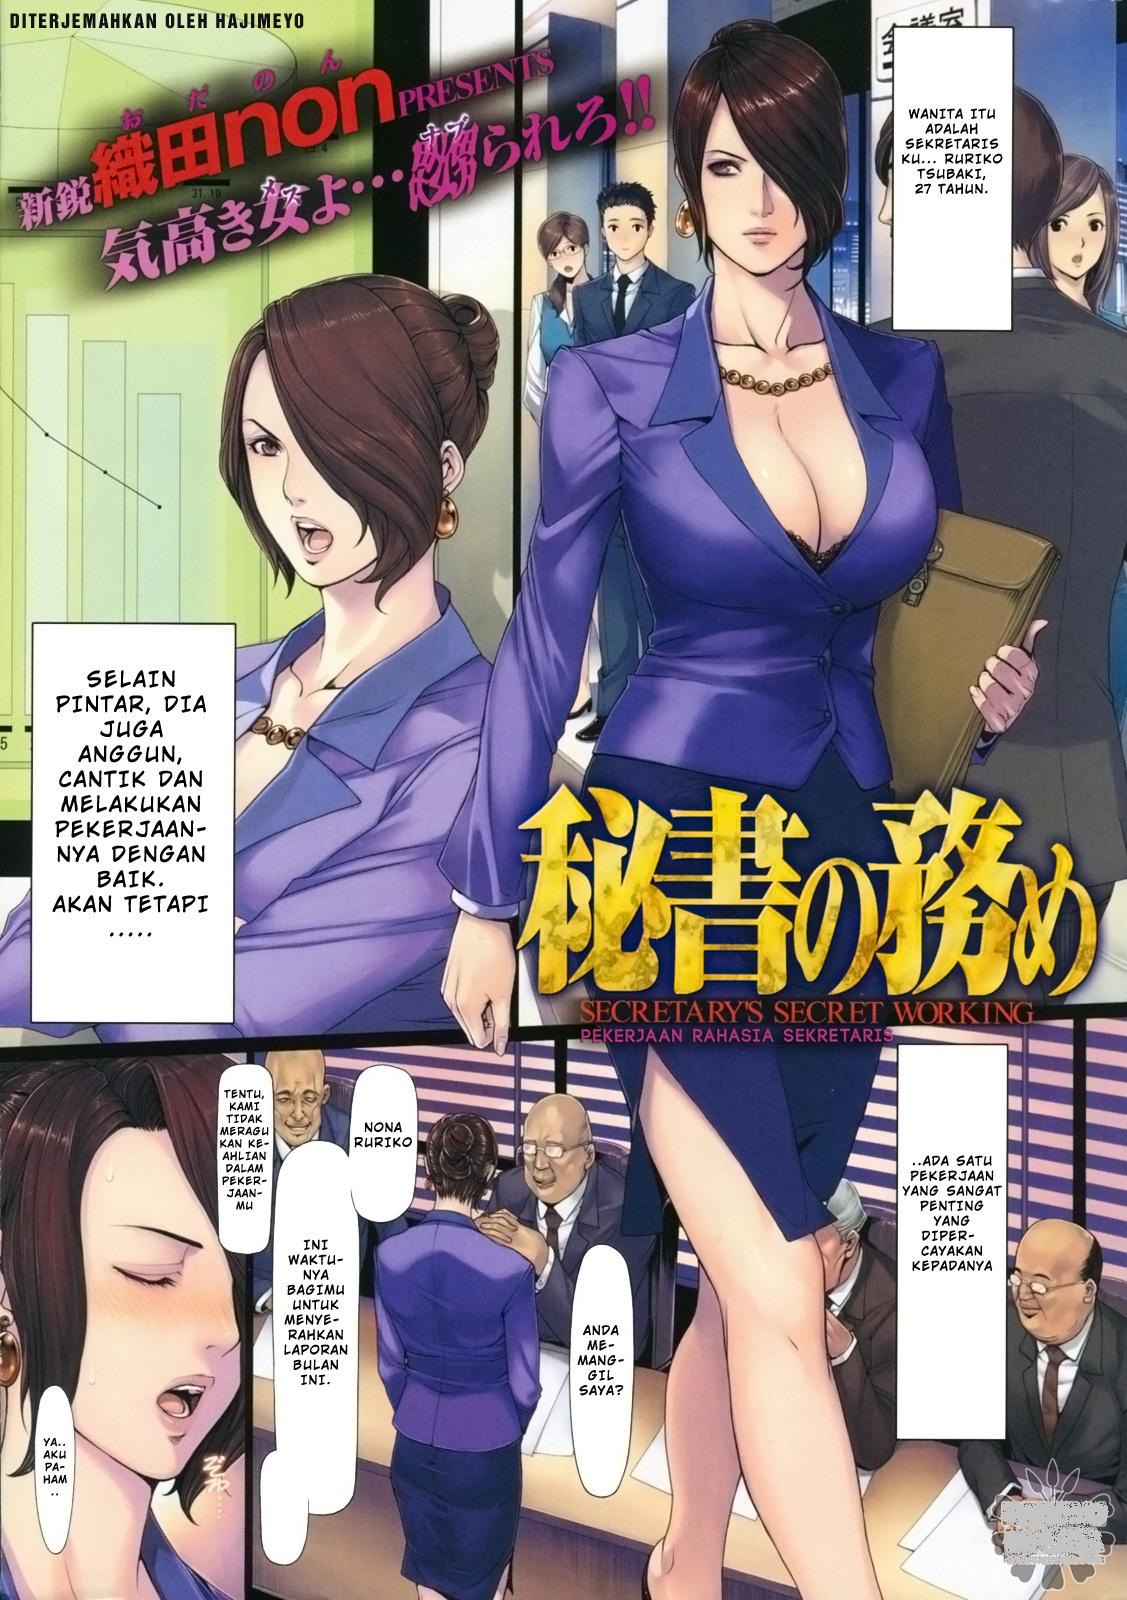 komic hentai berwarna:Daftar Komik Bahasa Indonesia – Mangaku